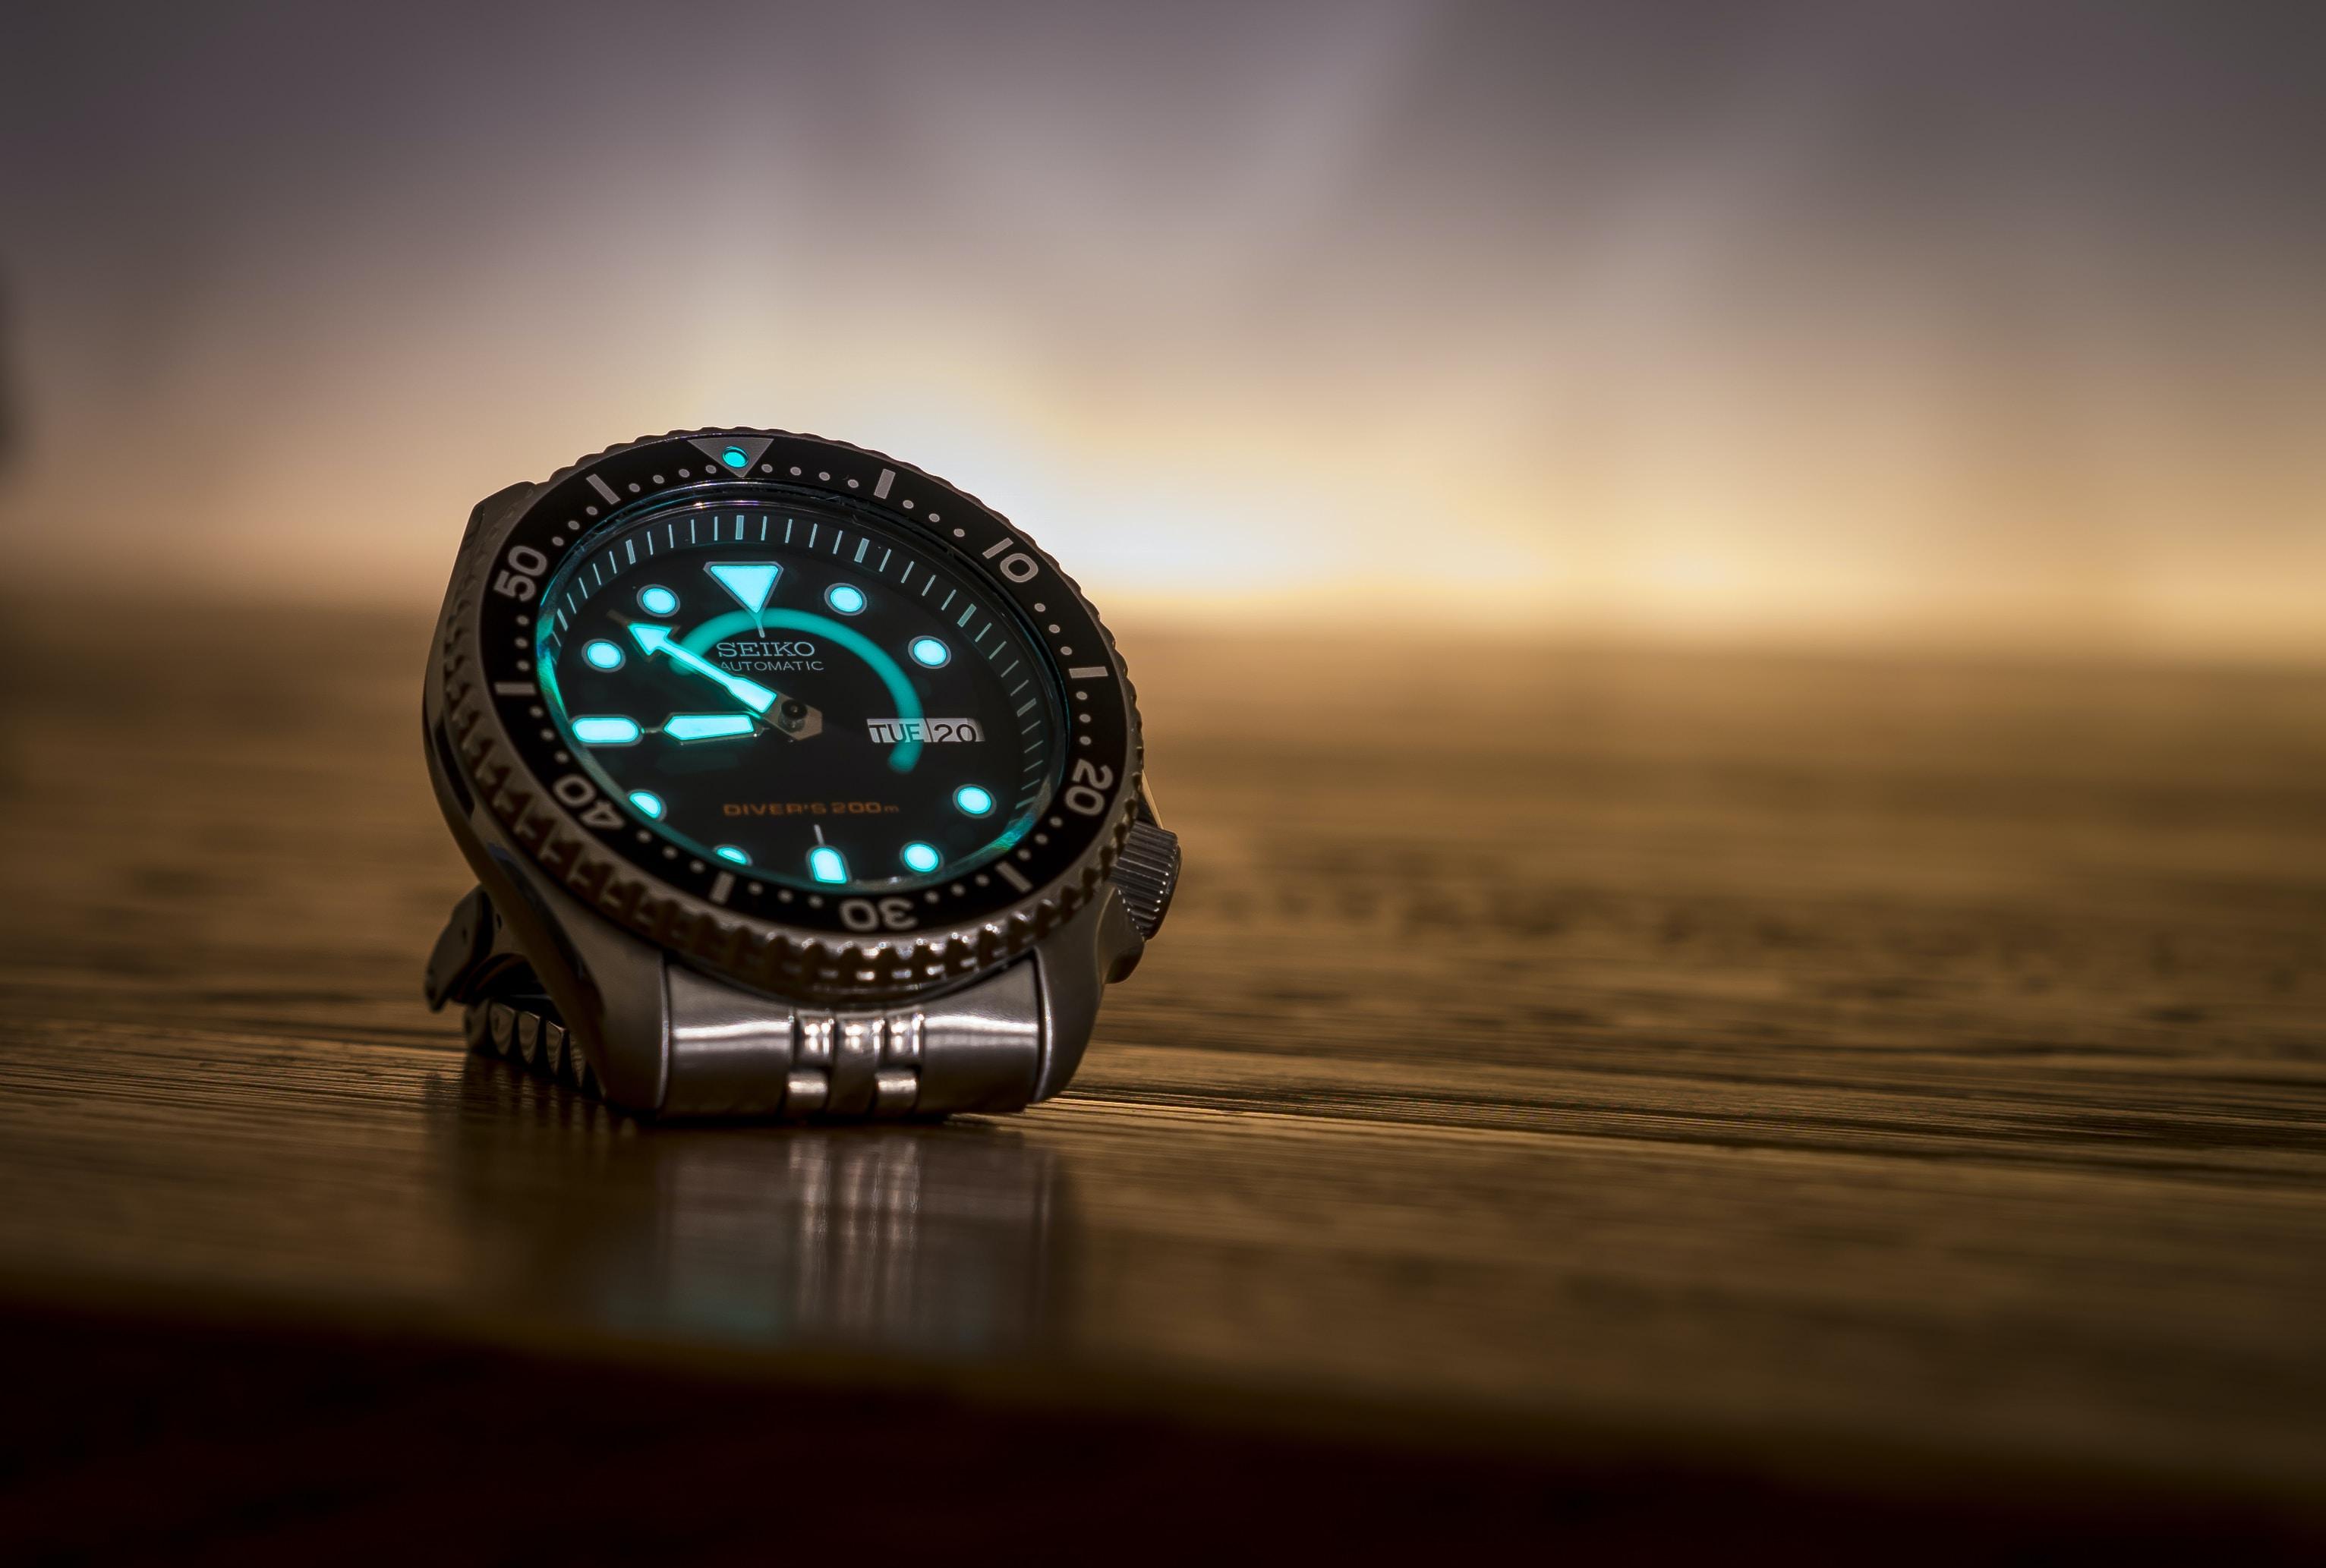 round black analog watch